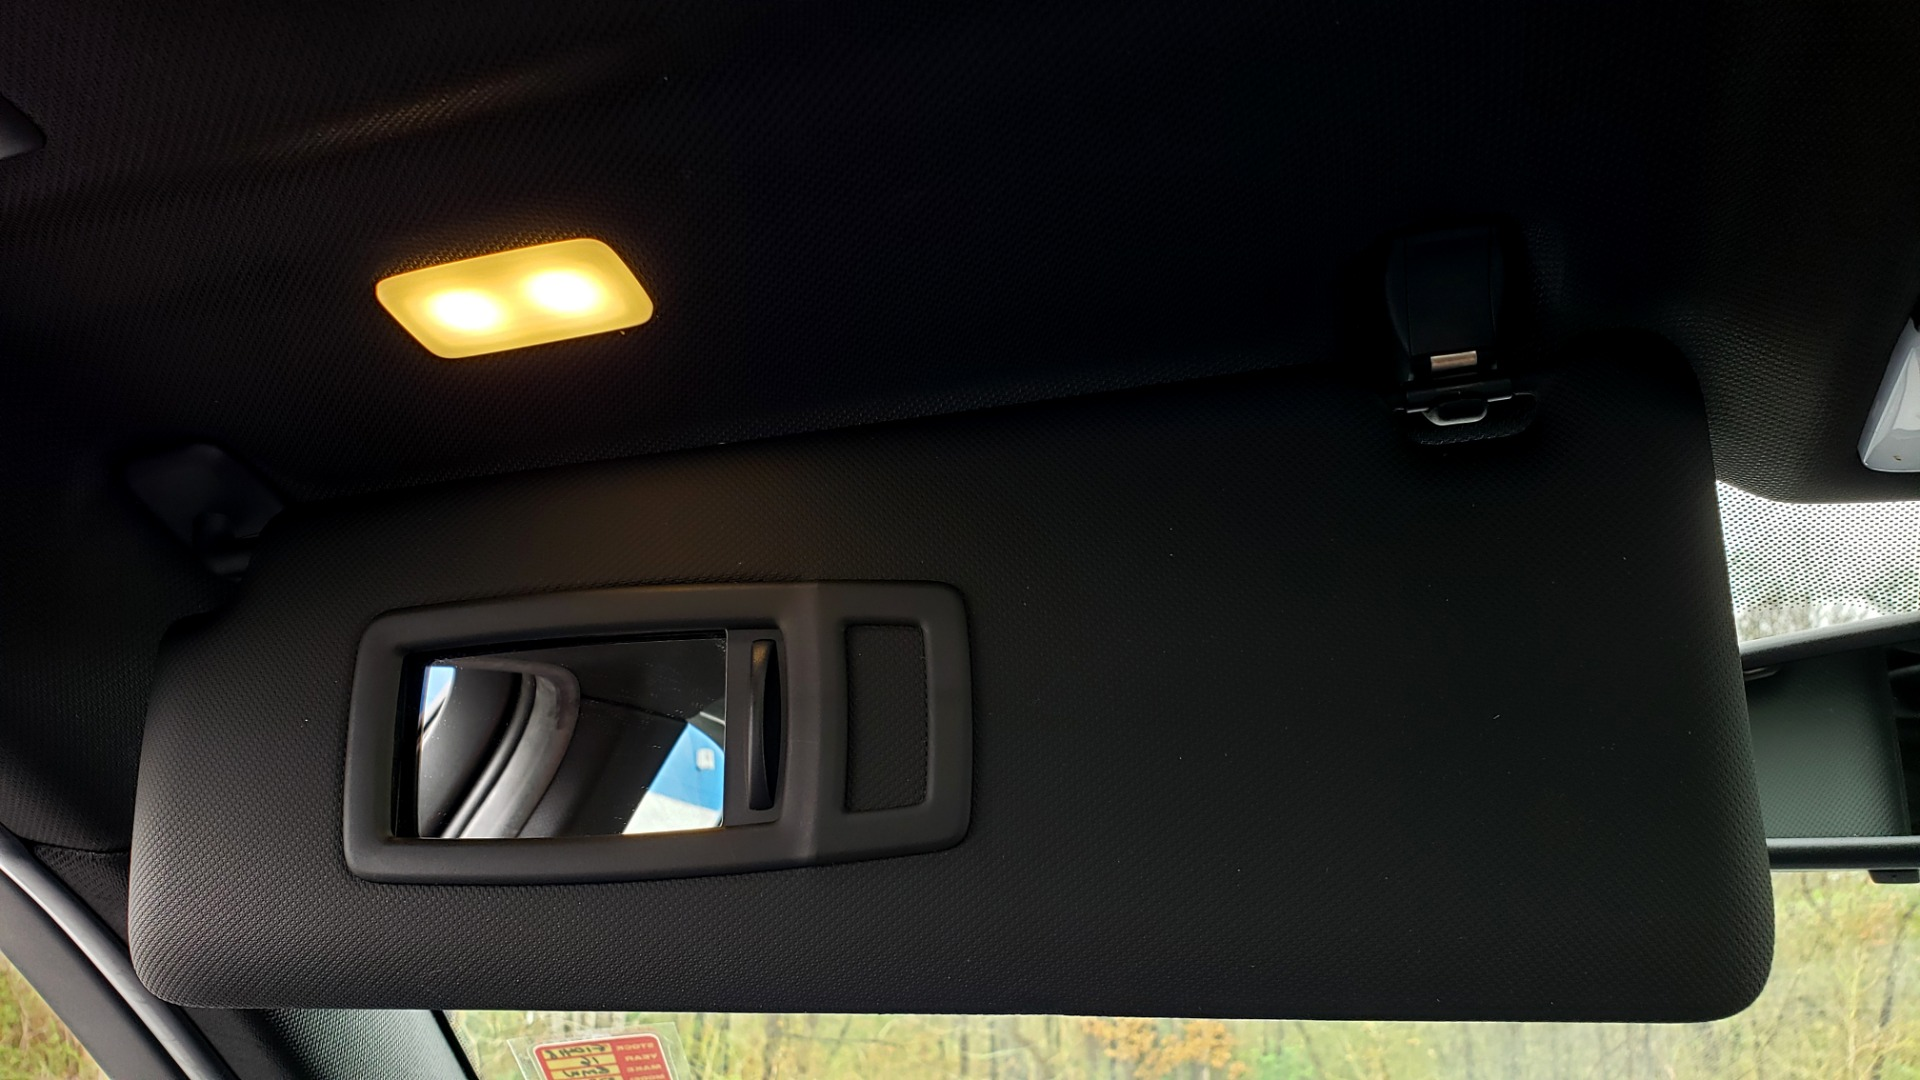 Used 2016 BMW 3 SERIES 328I PREMIUM PKG / DRVR ASST / SUNROOF / PARK ASST for sale Sold at Formula Imports in Charlotte NC 28227 49